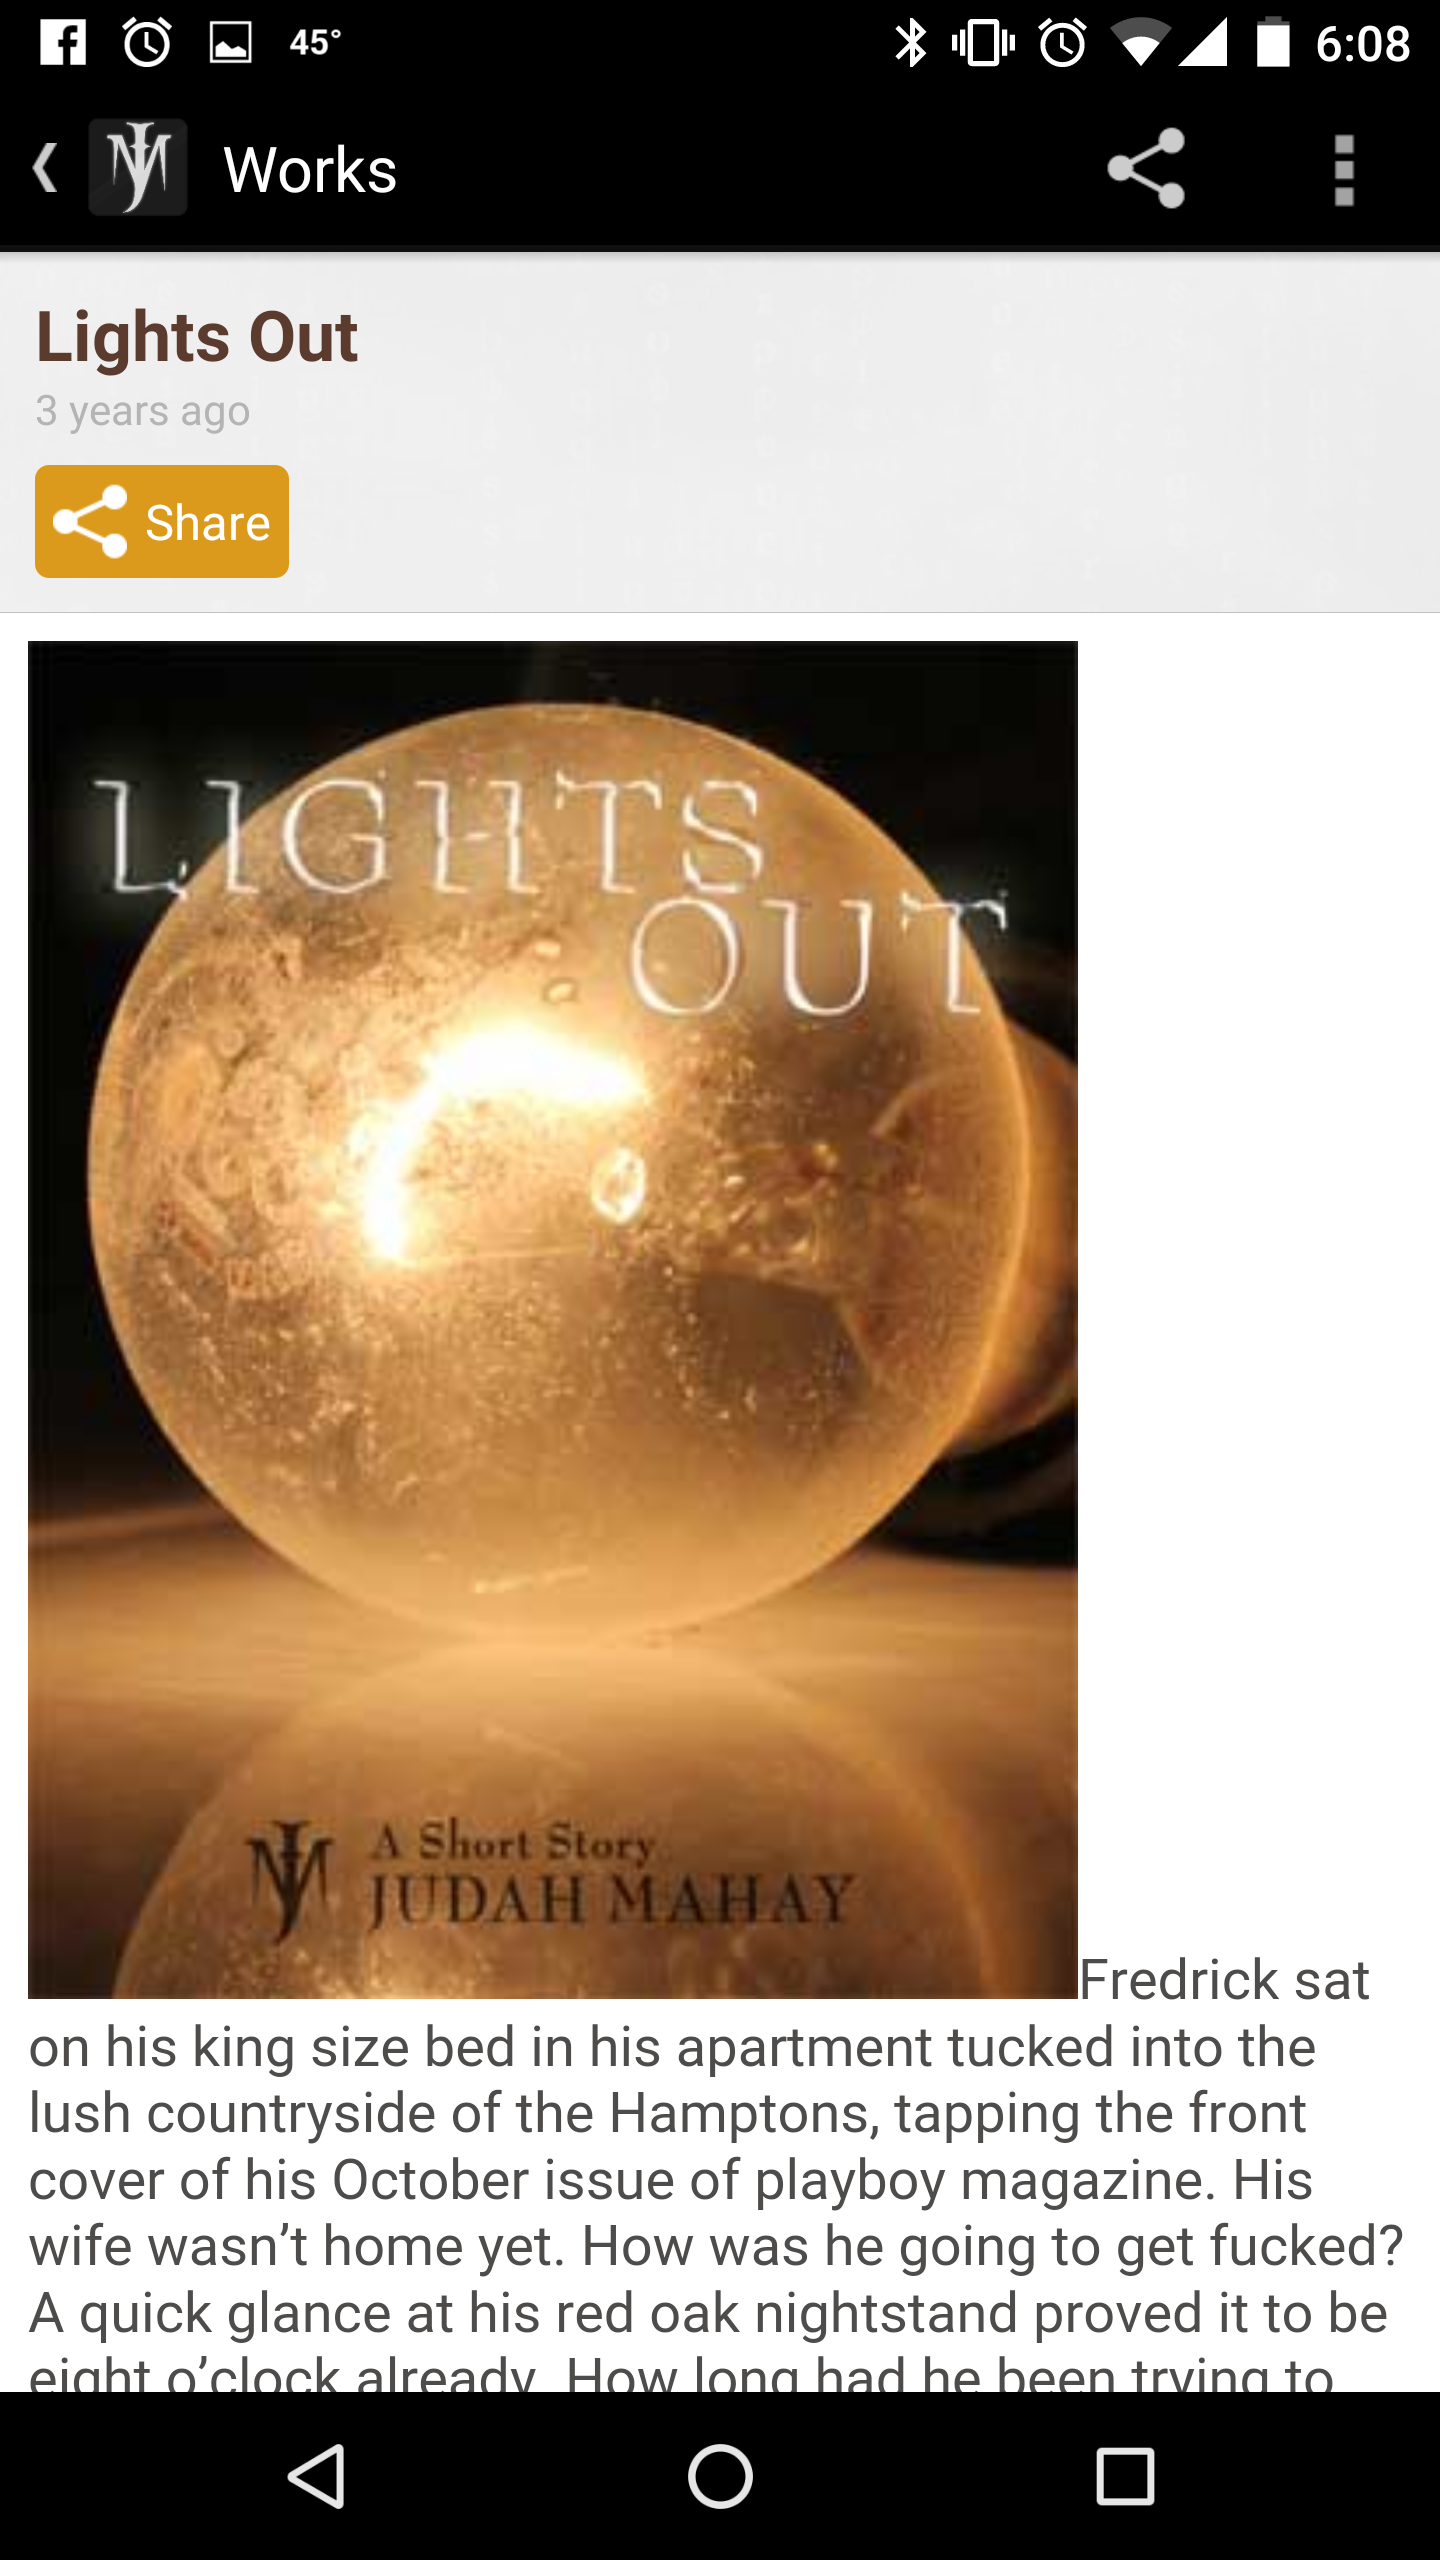 Judah Mahay, Author App